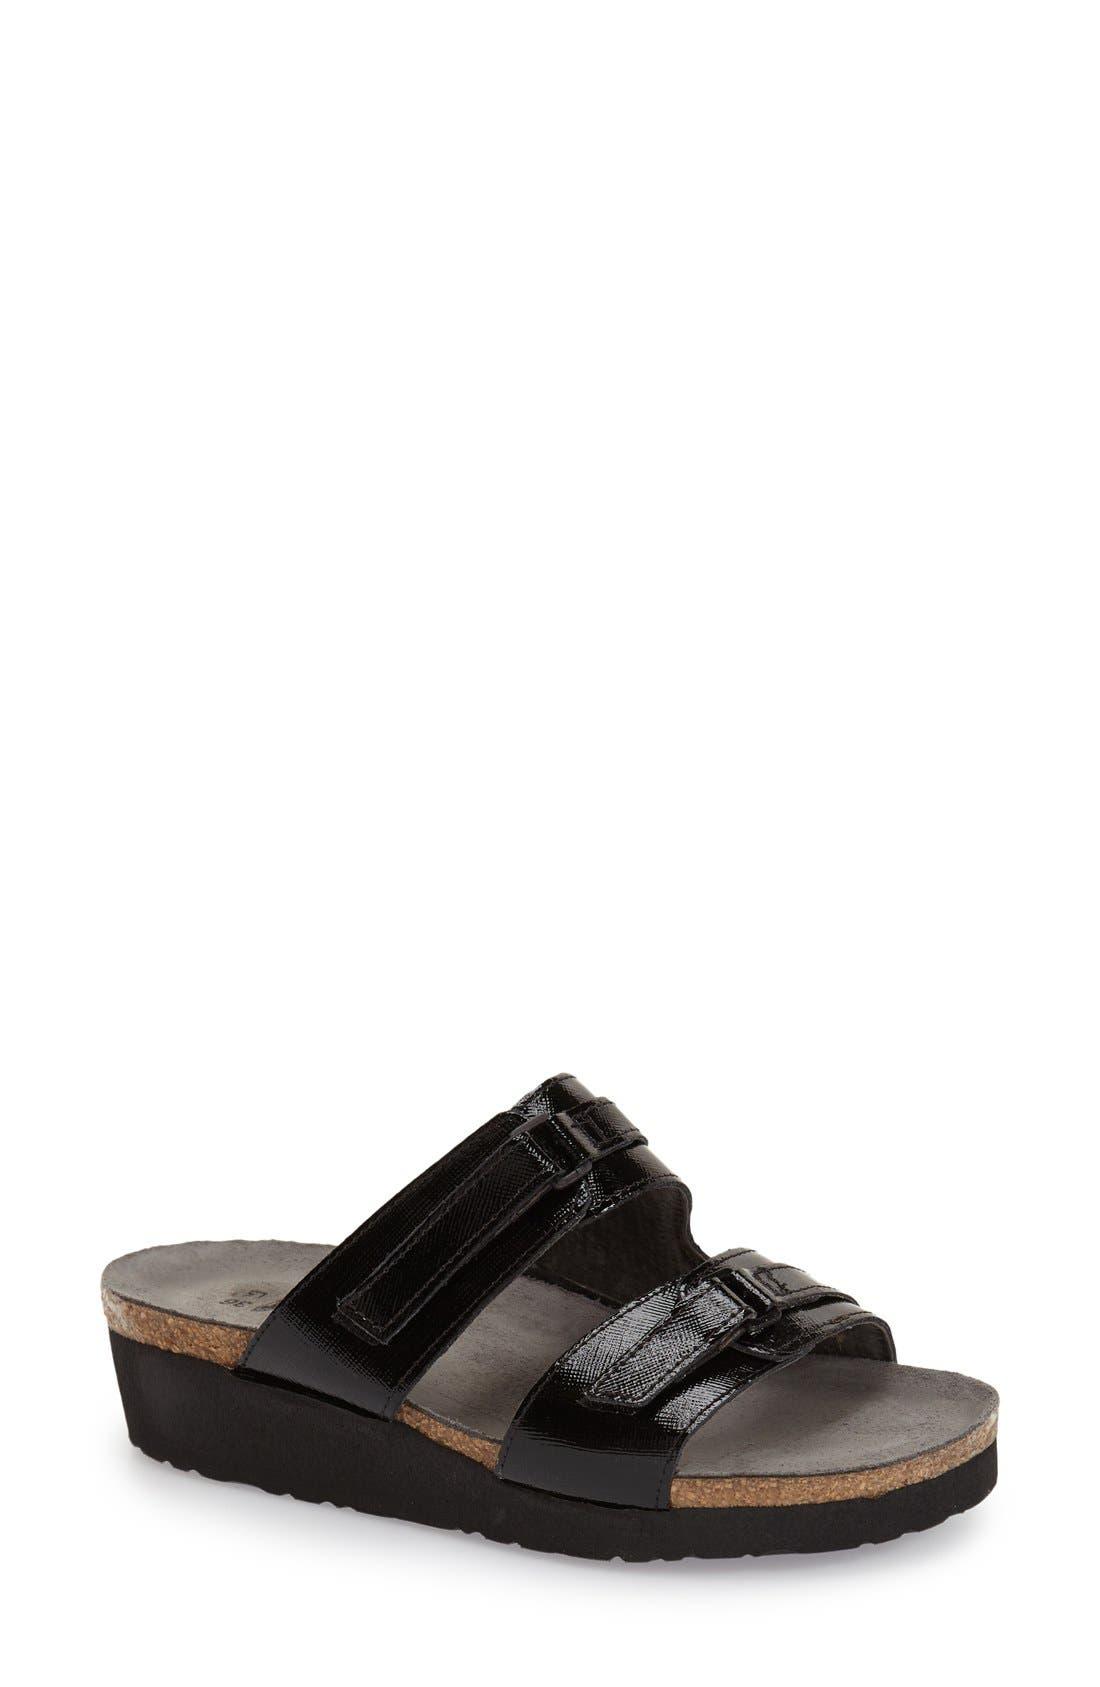 'Carly' Slide Sandal,                         Main,                         color, 001